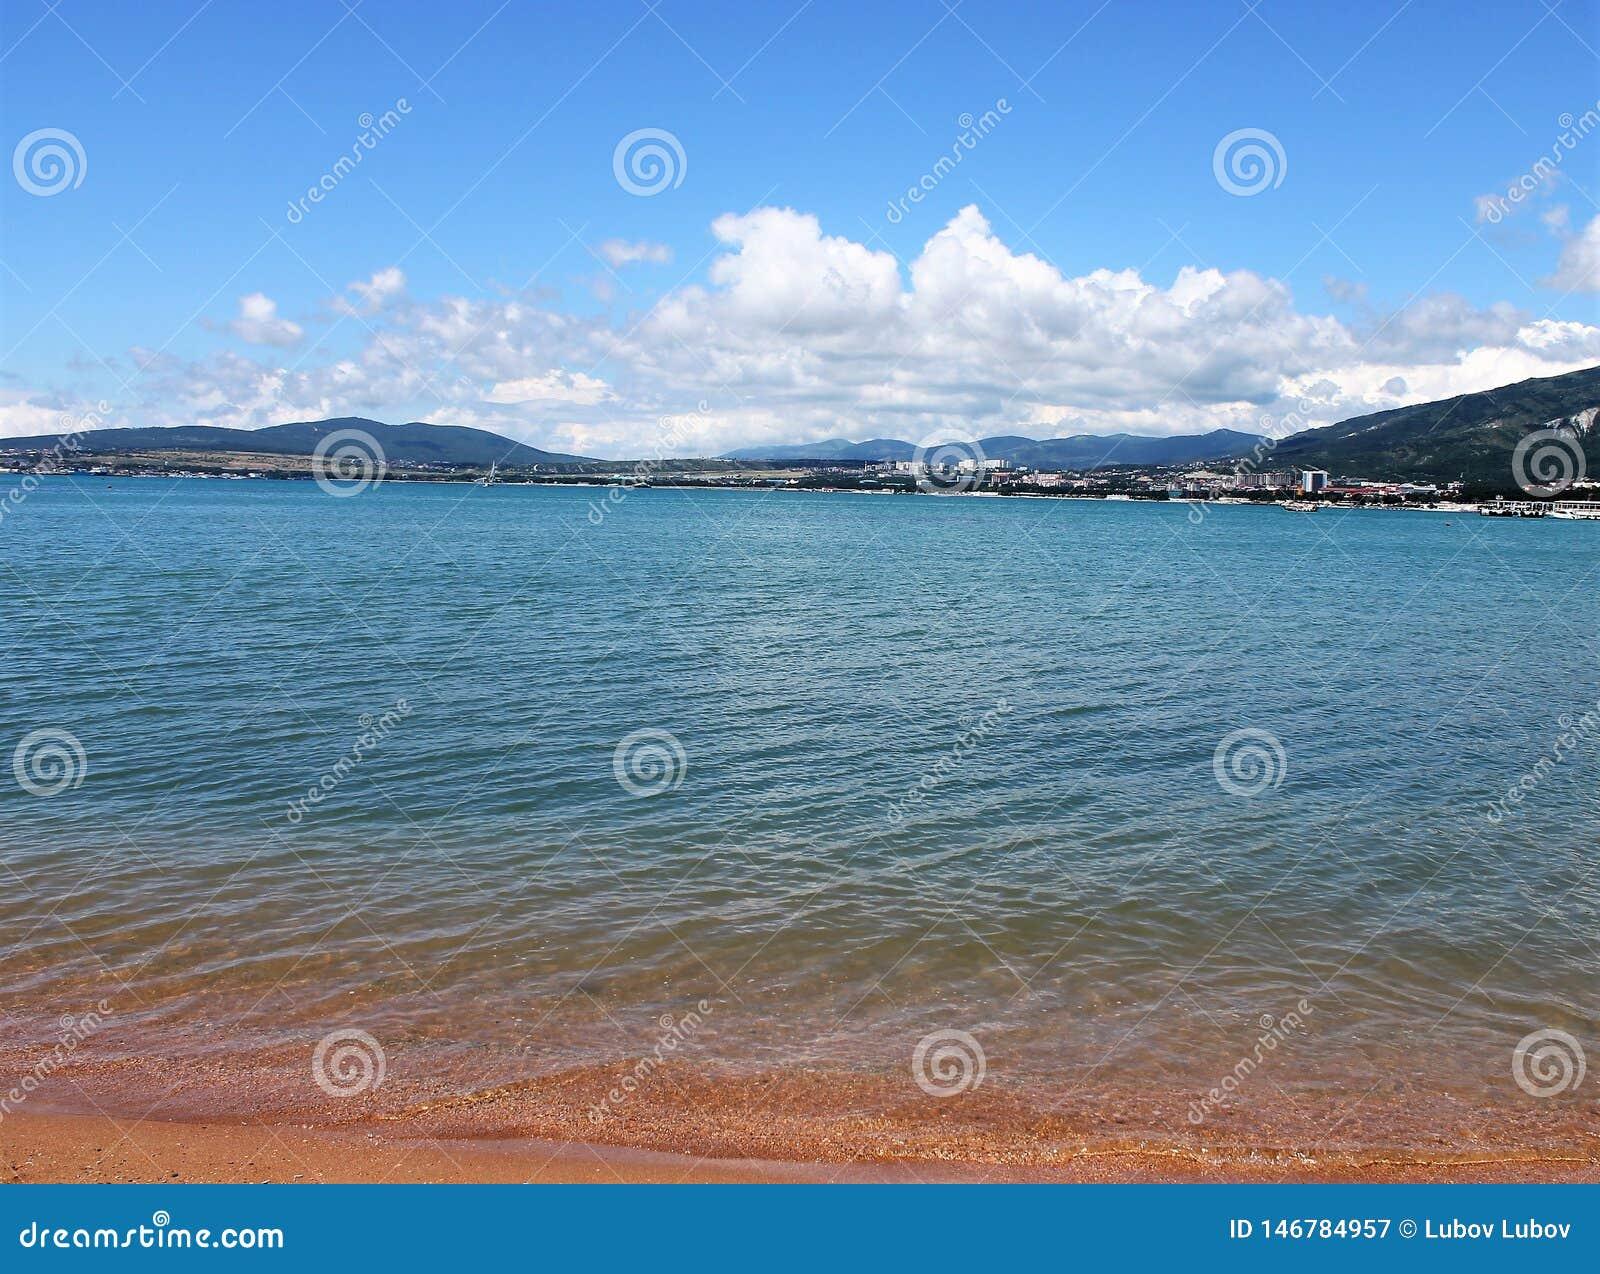 Piaskowata pla?a, cudowny morze i widoki g?rscy,